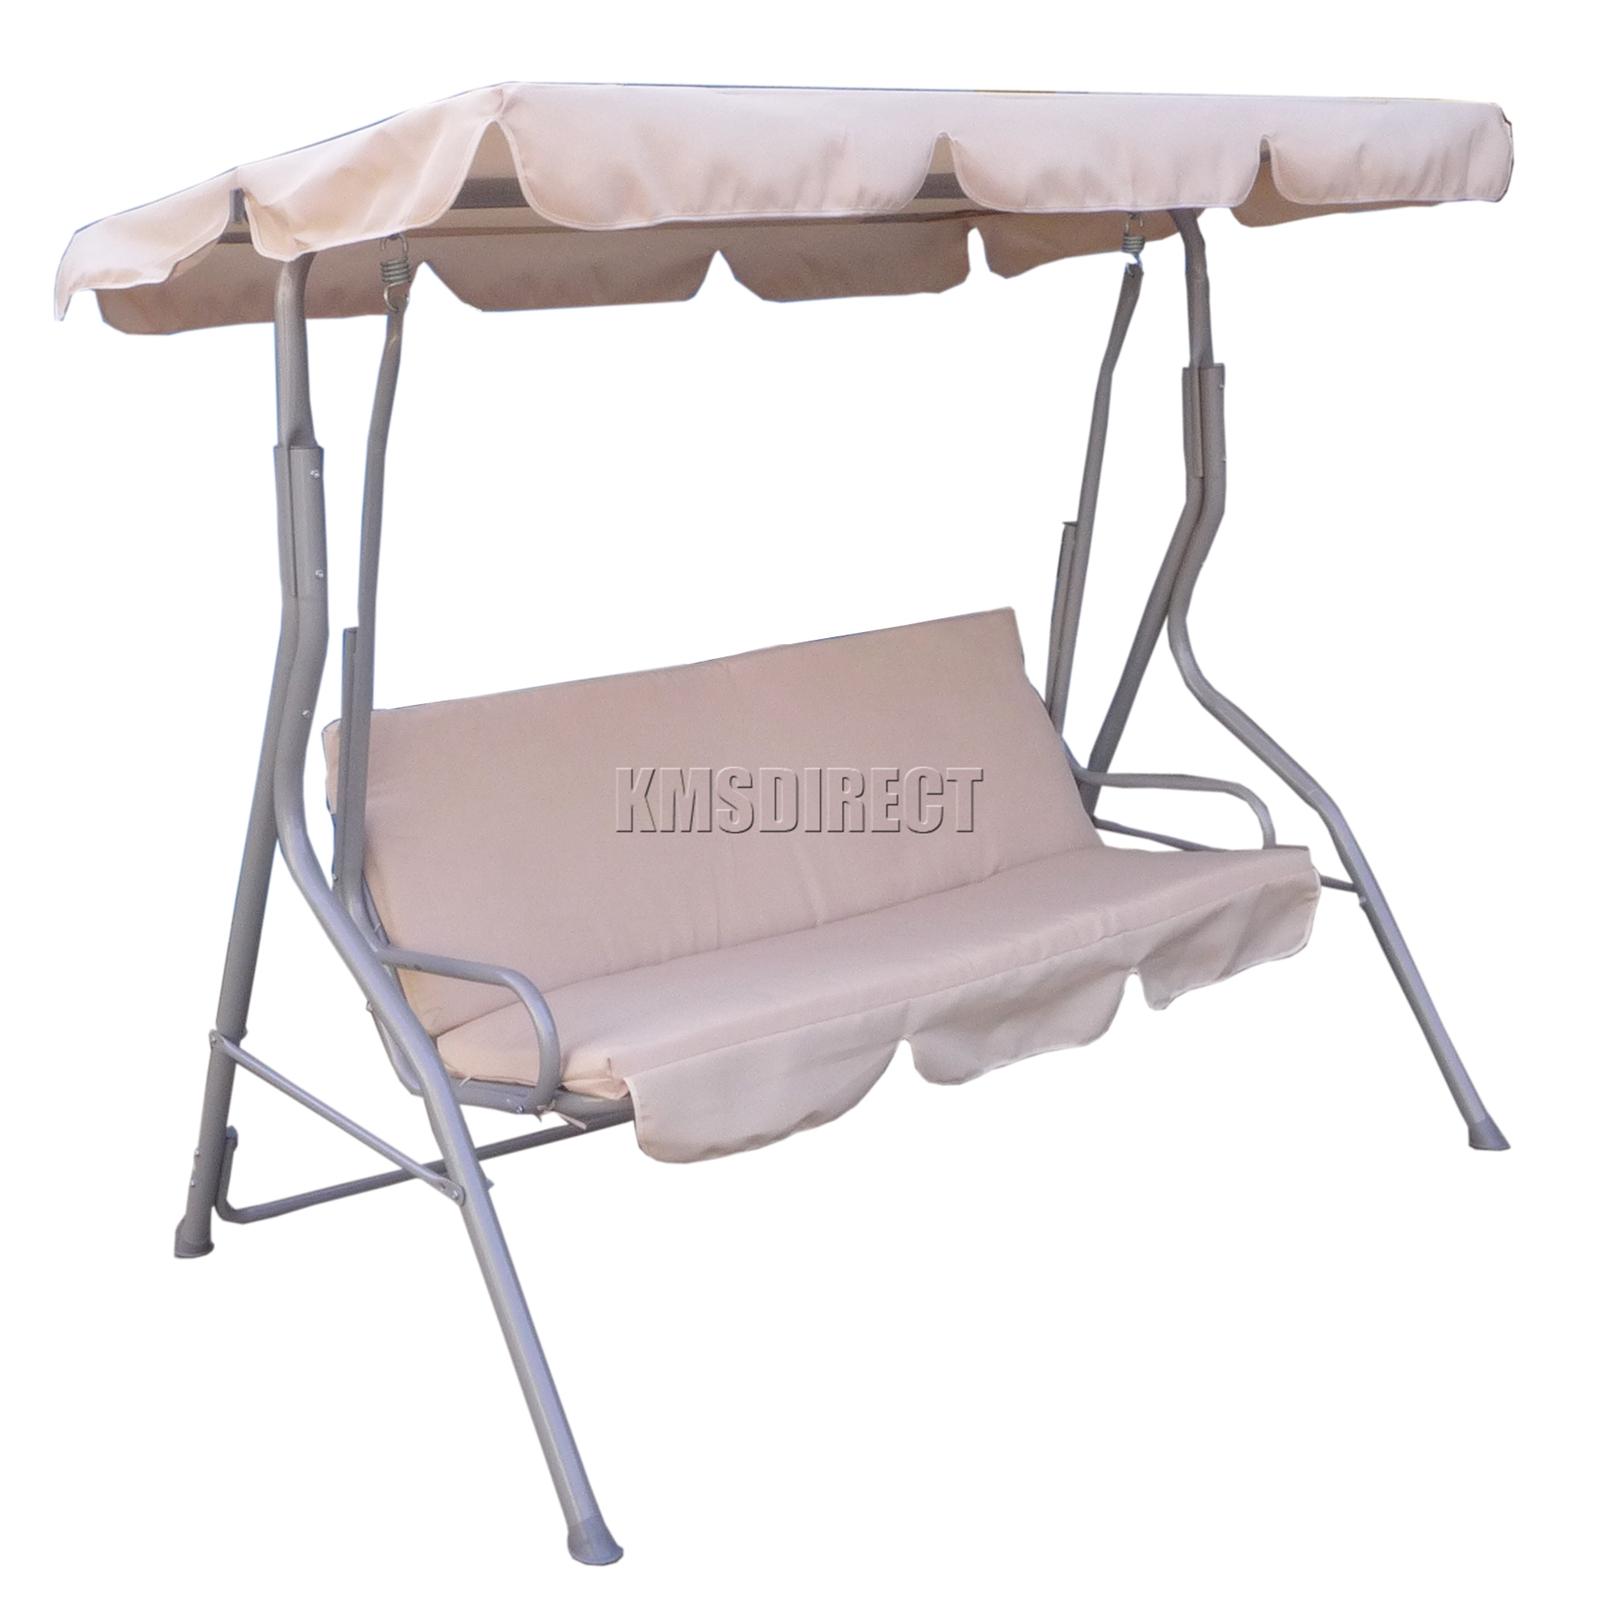 Foxhunter Fhsc01 Garden Metal Swing Hammock 3 Seater Chair Bench Patio Beige New Ebay